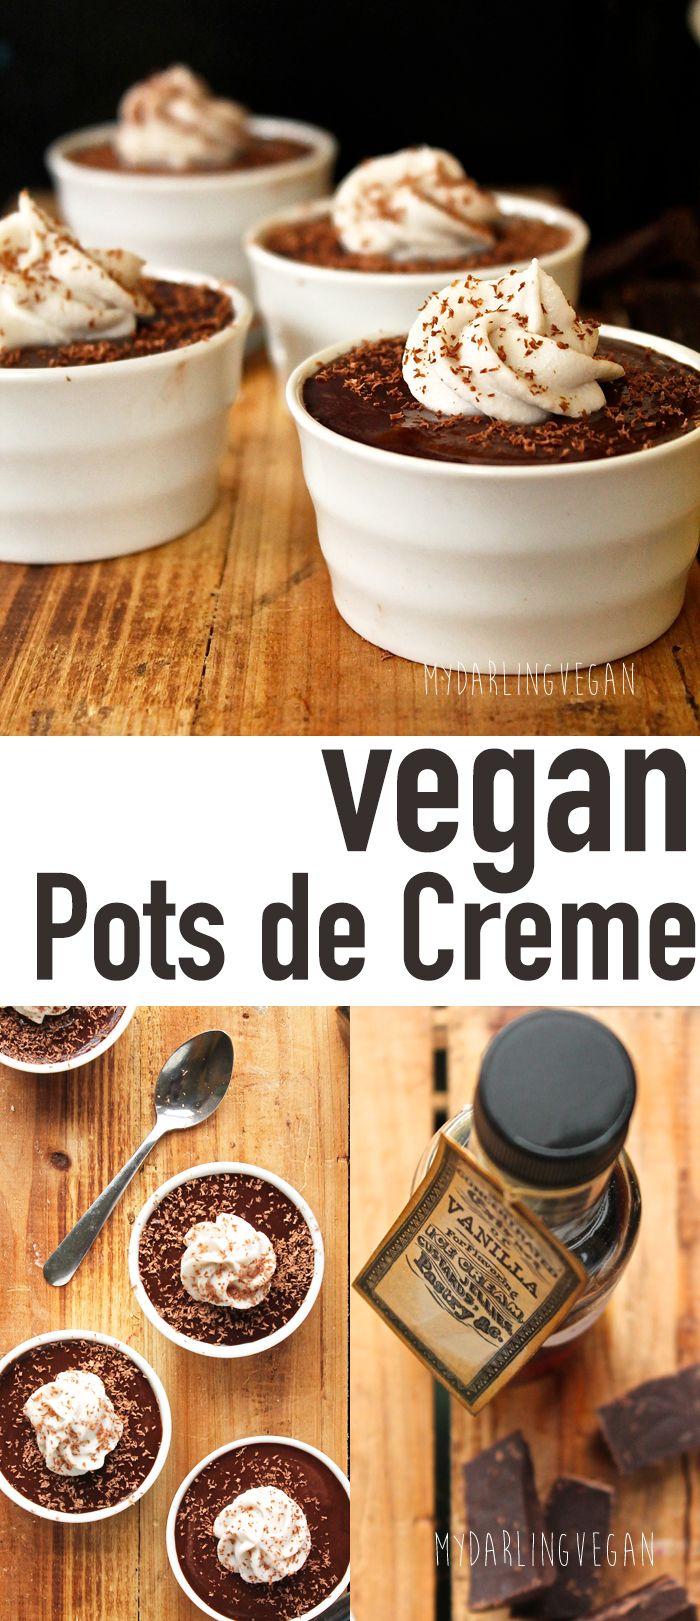 995 best must make vegan desserts images on pinterest vegan impress your friends with this truly amazing next level vegan dessert sisterspd